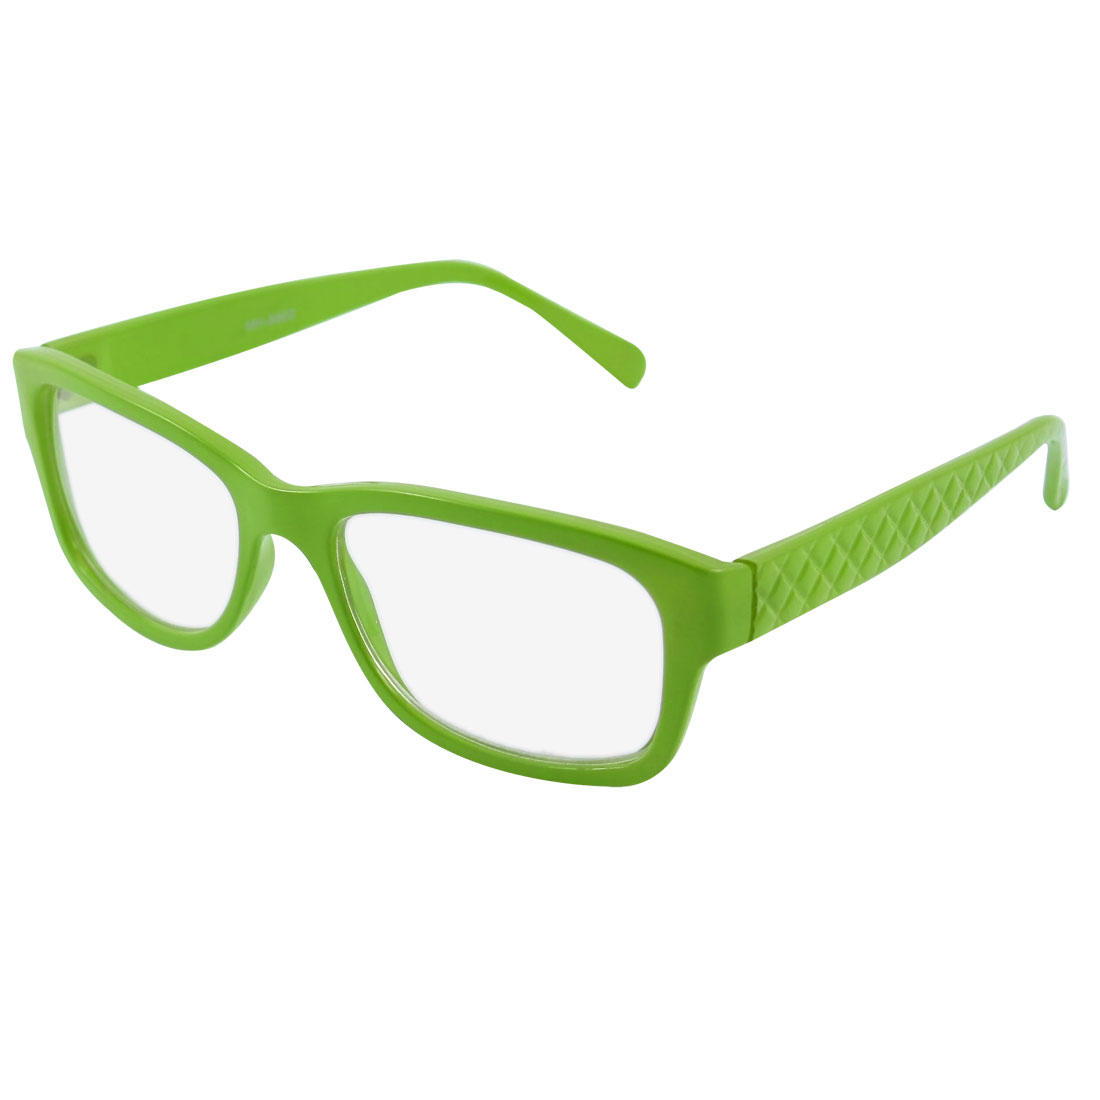 Green Clear Lens Glasses